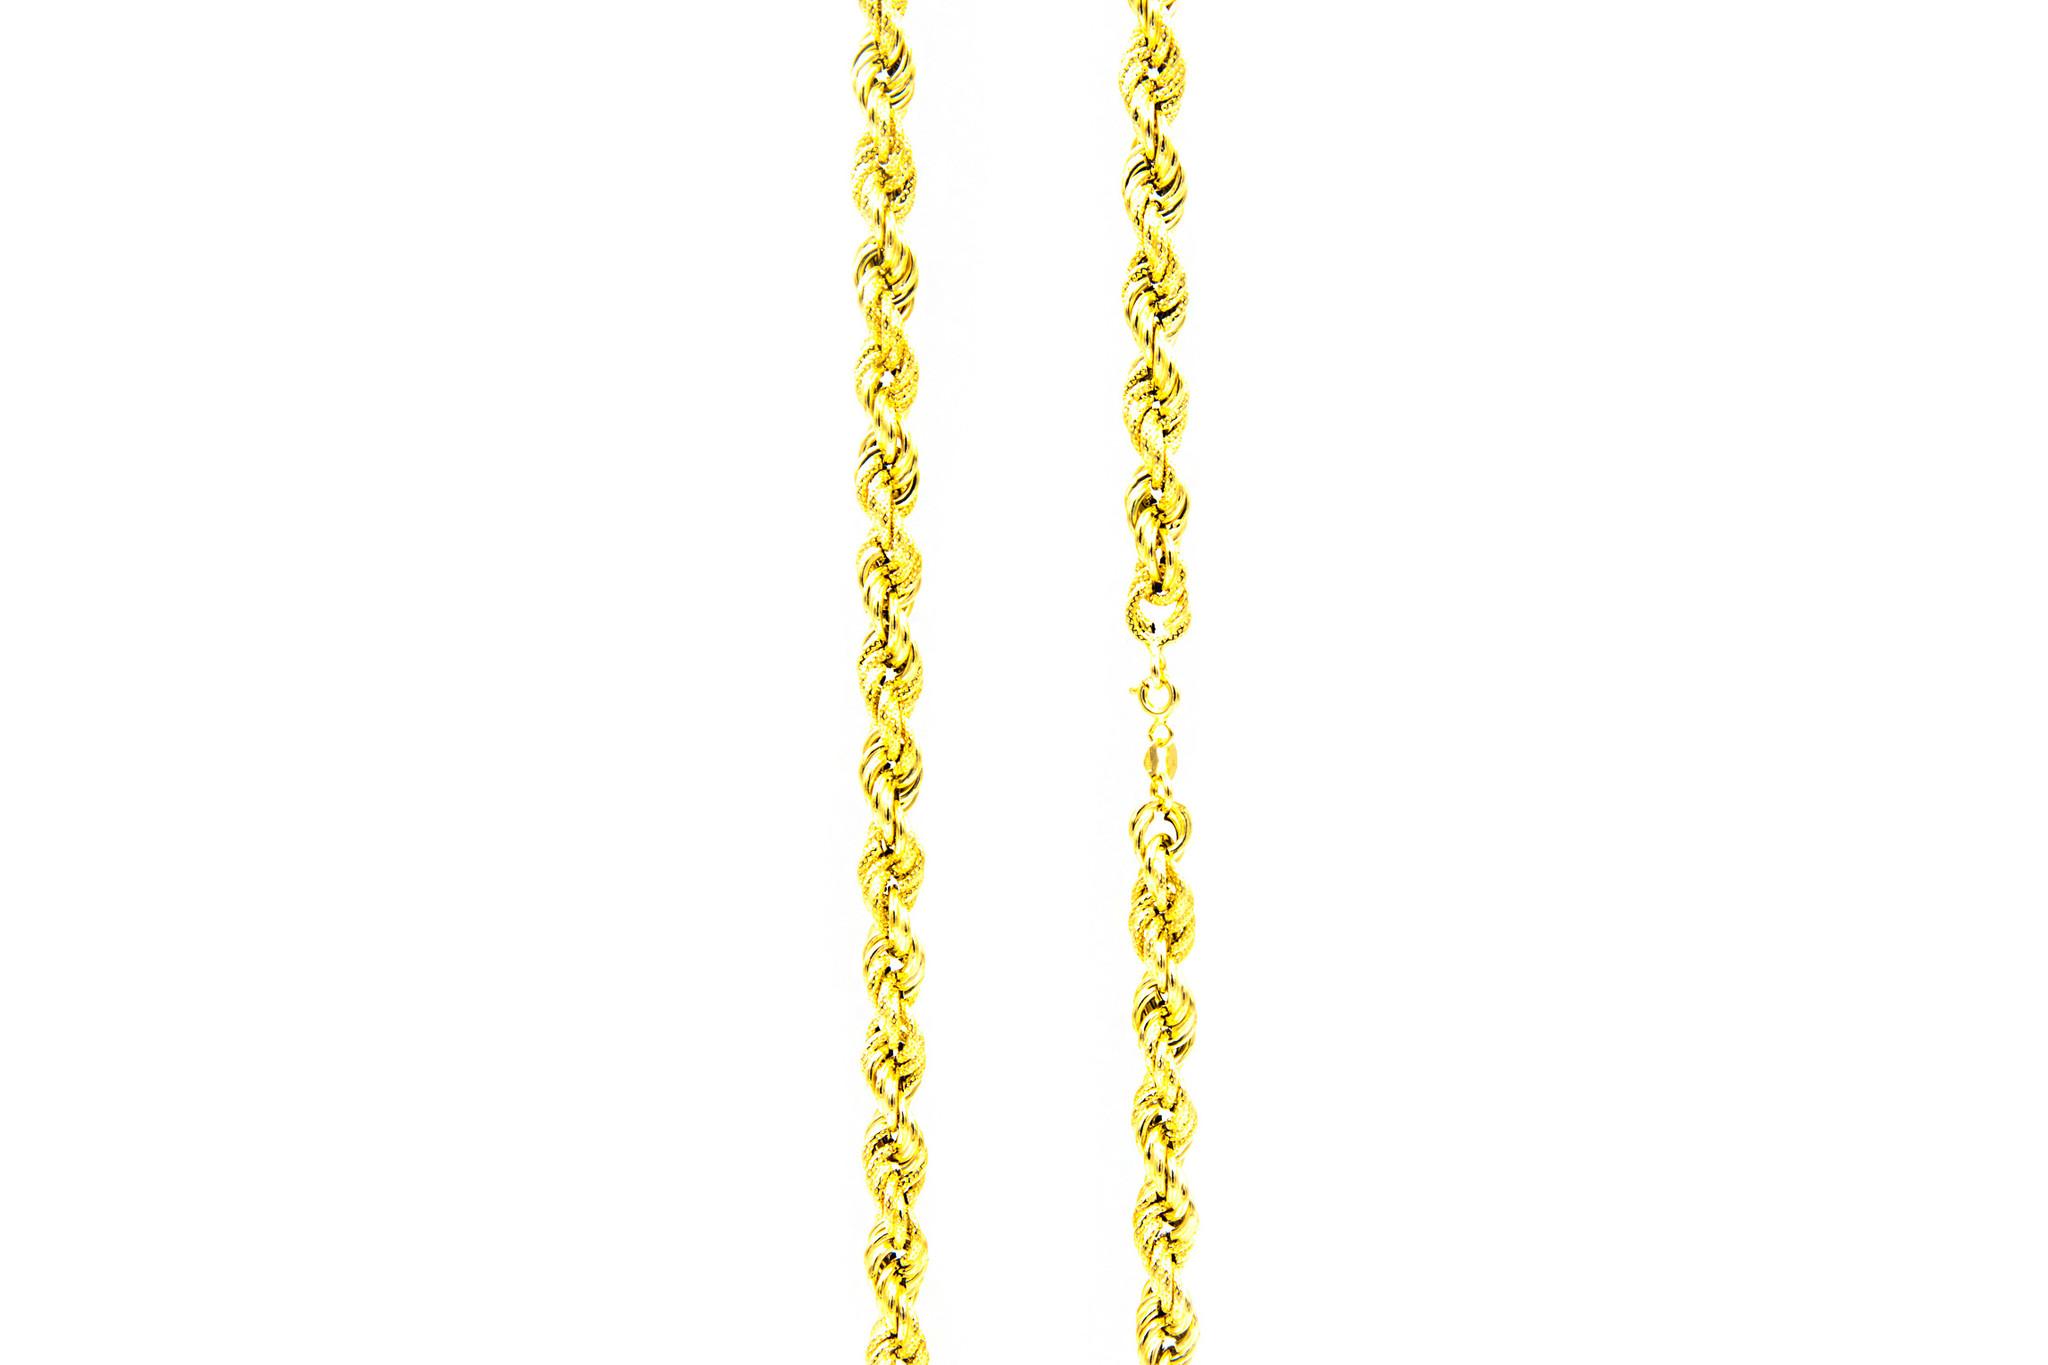 Ketting rope chain gedeeltelijk diamond cut-3